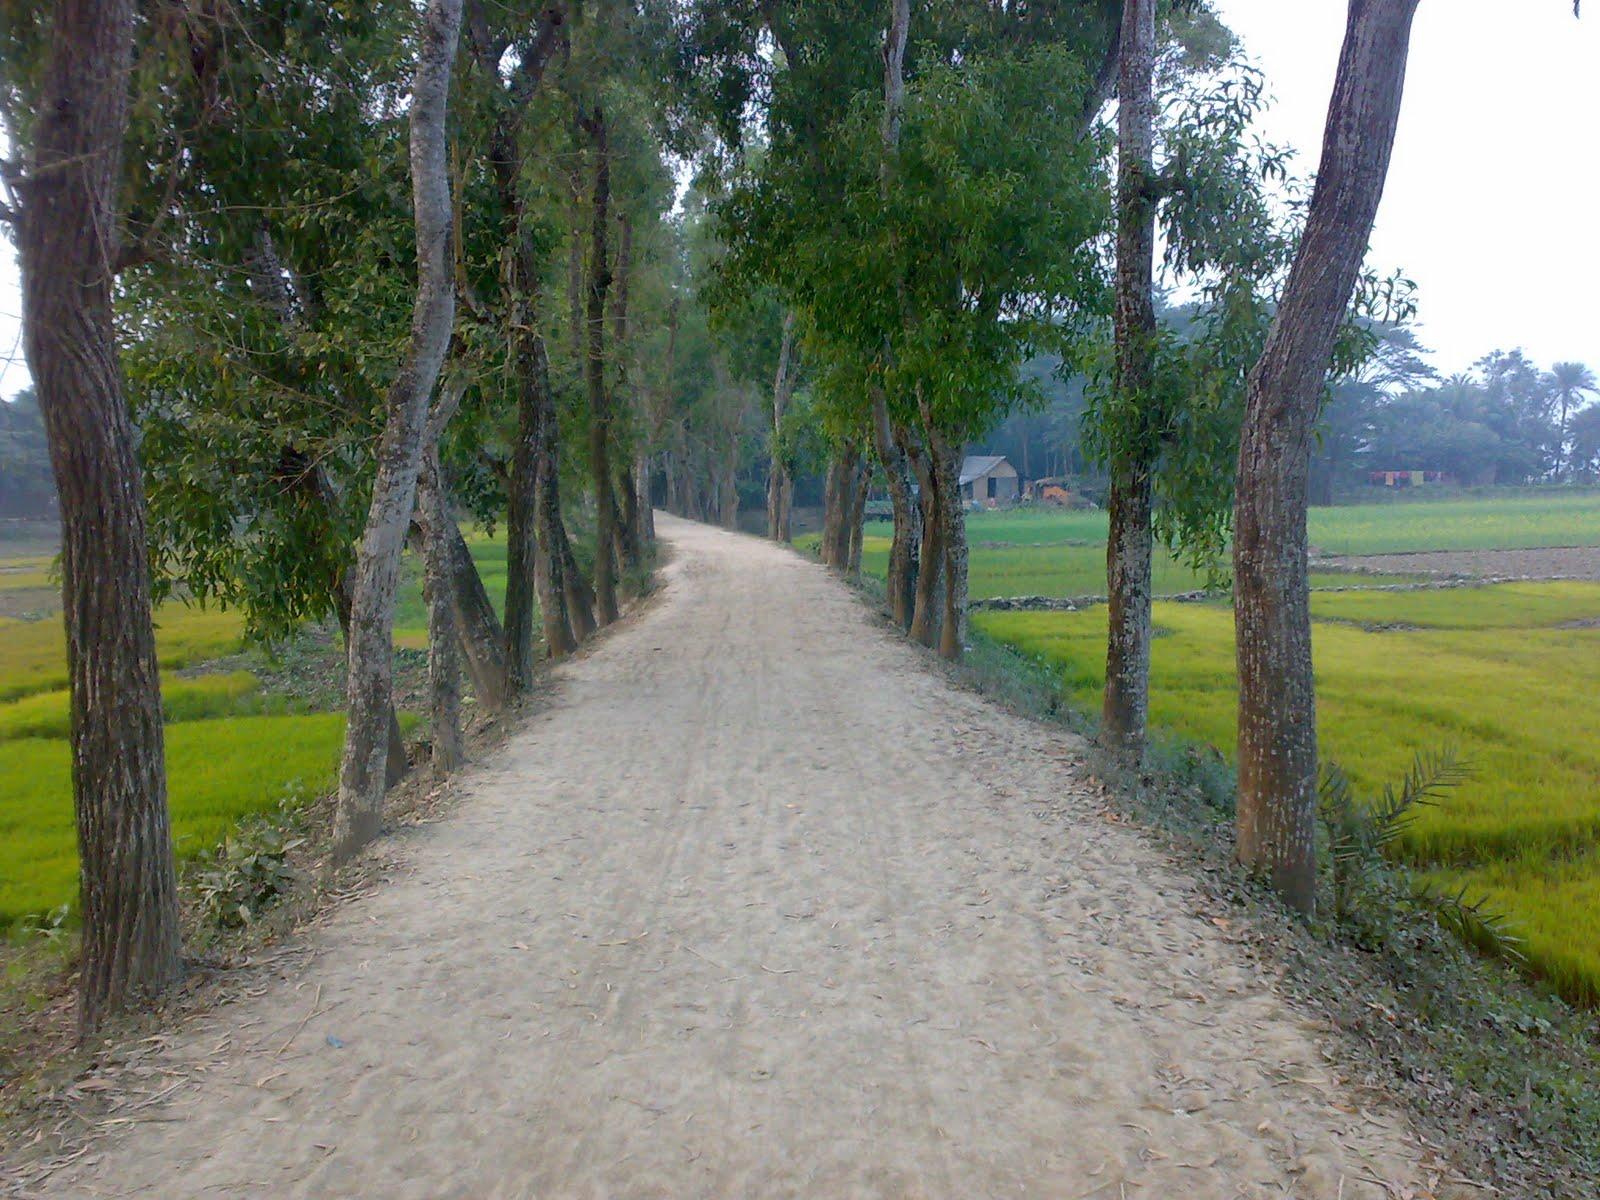 most of bangladesh village road is broken